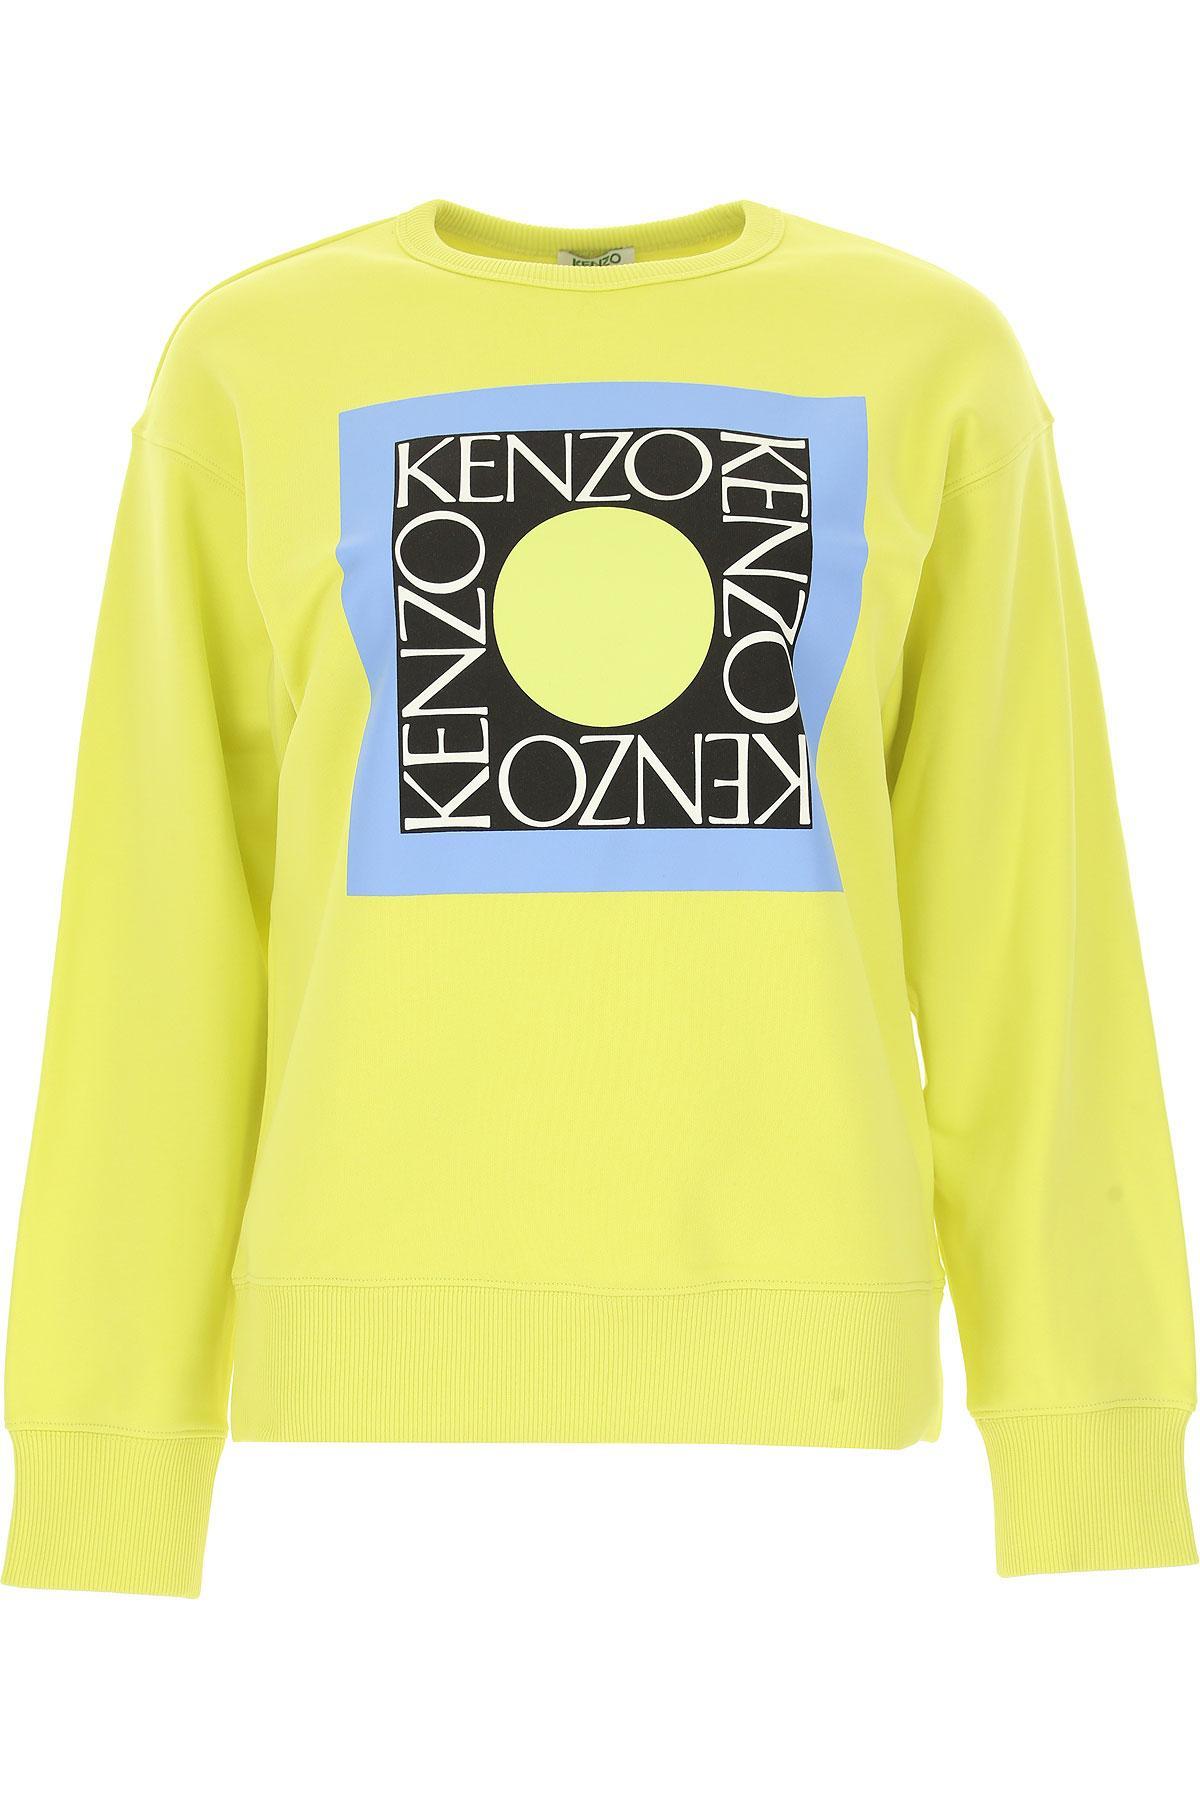 KENZO - Yellow Sweater For Women Jumper - Lyst. View fullscreen 530dbec958